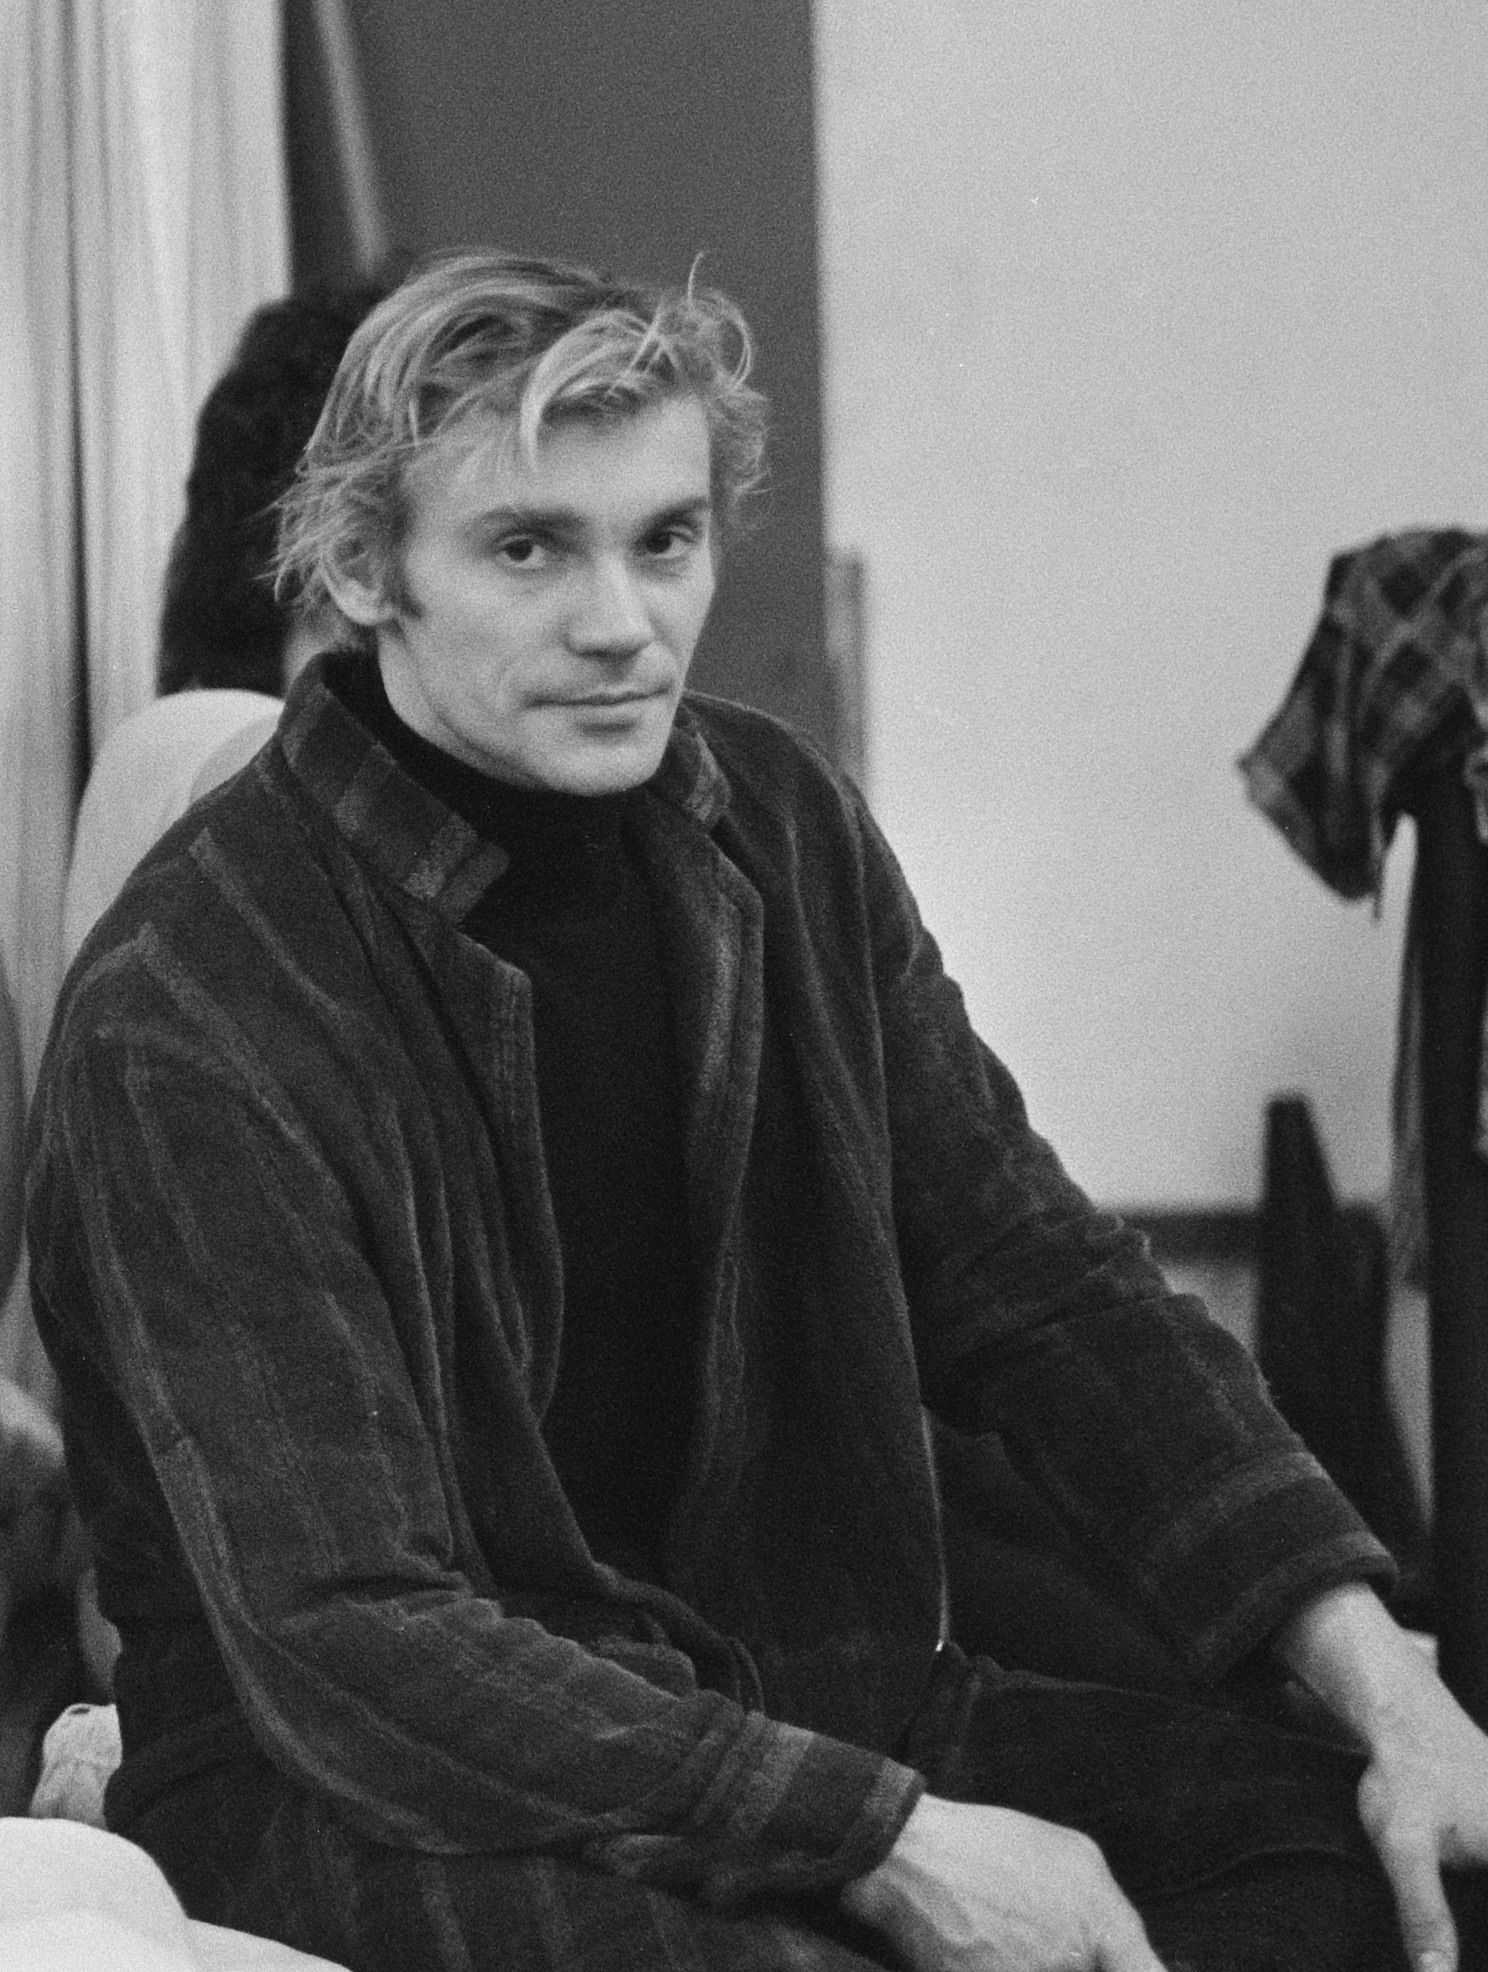 Photo of Vladimir Vasiliev (dancer): Soviet dancer